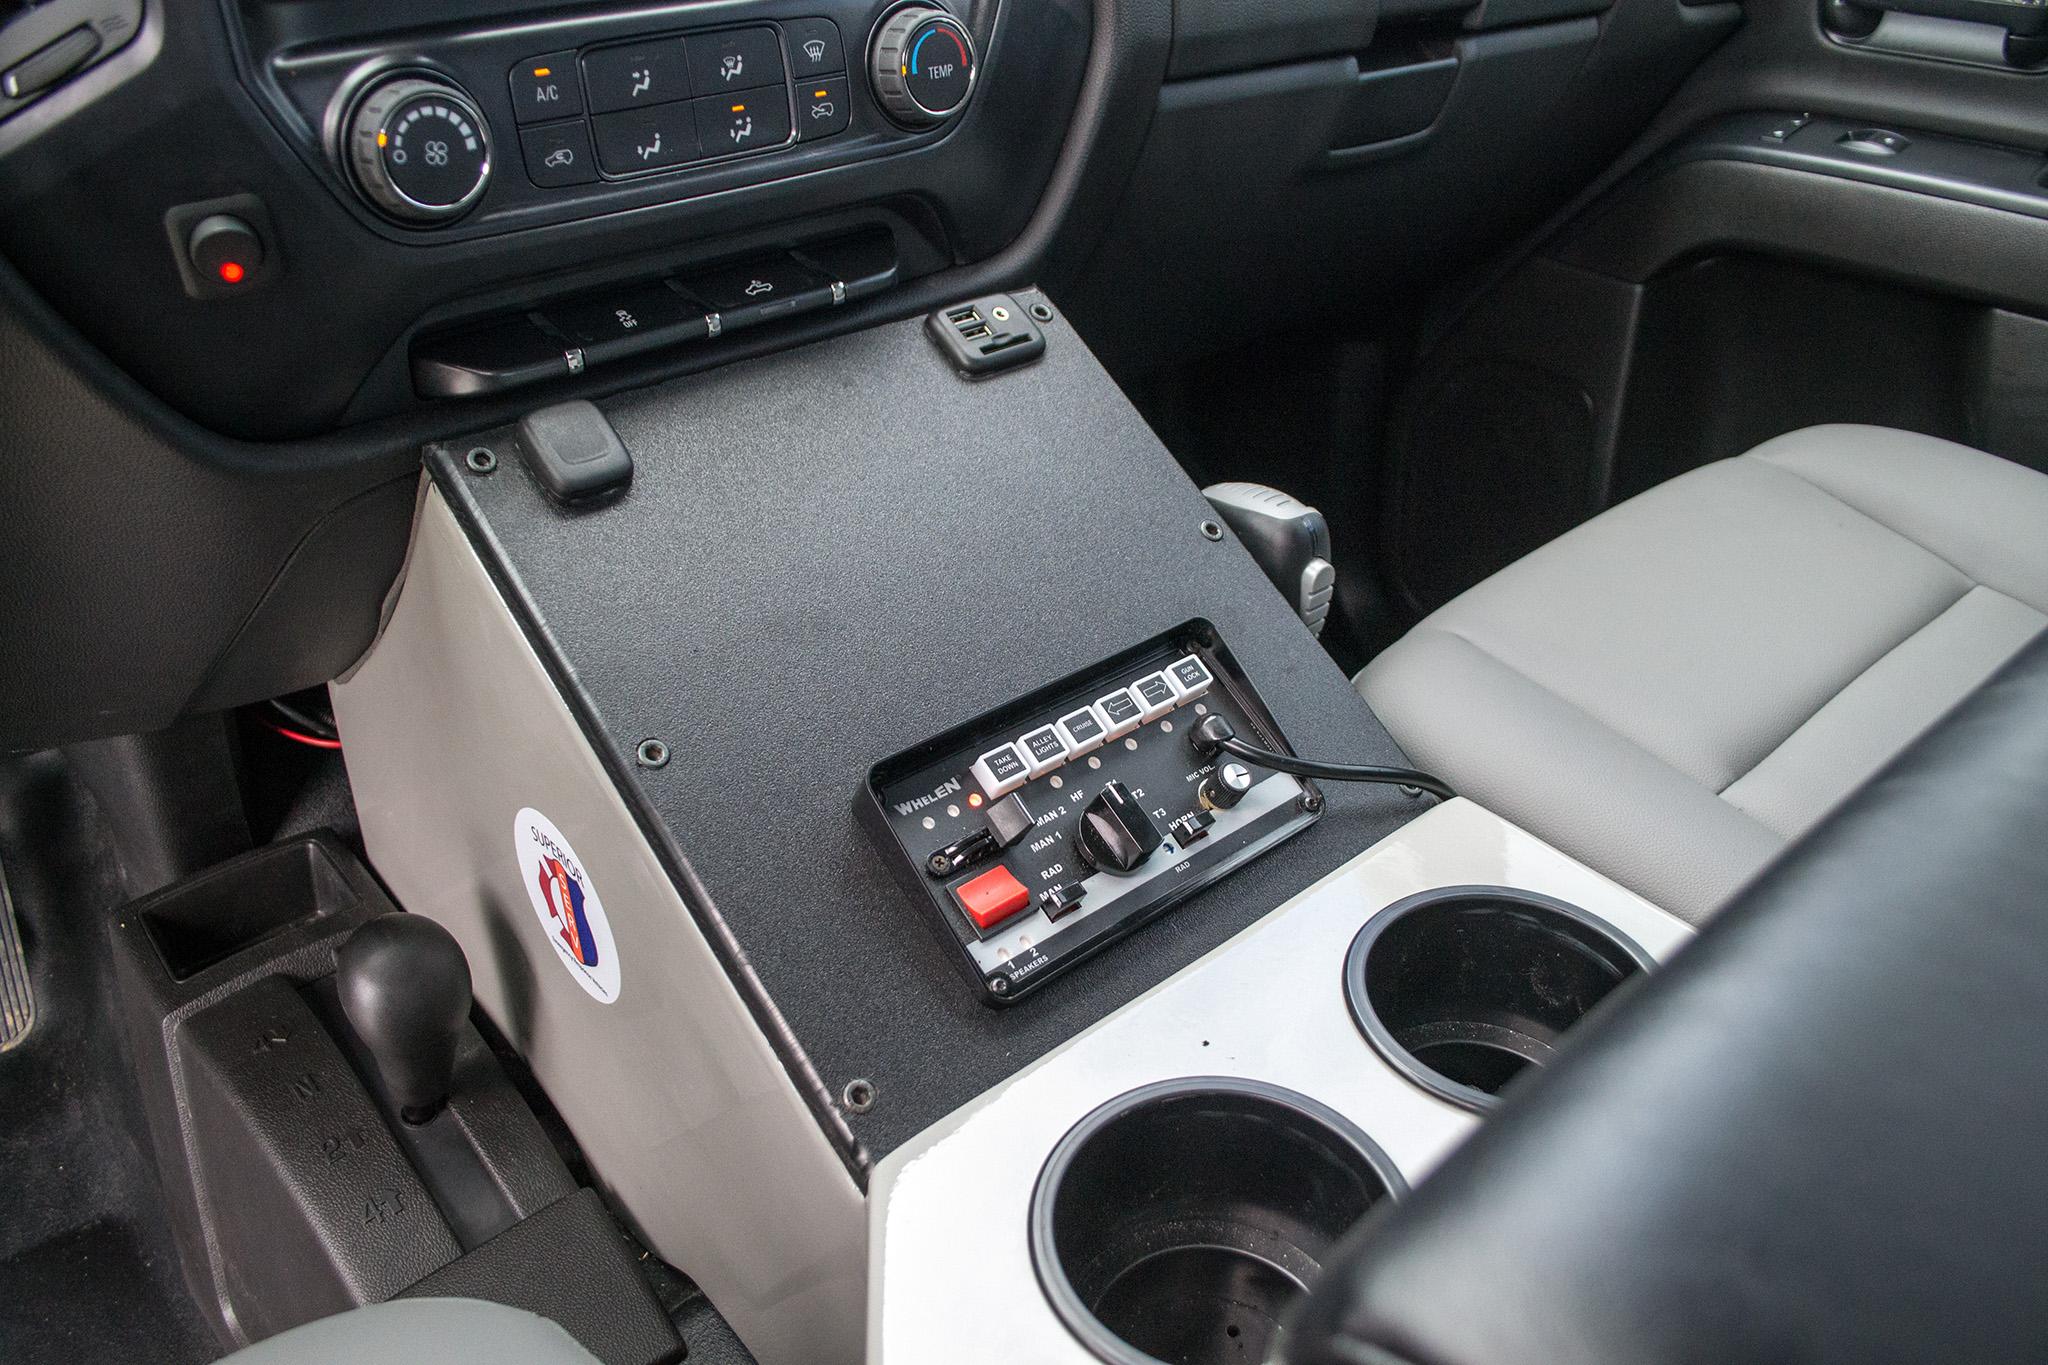 2016 Silverado | Emergency Vehicles | Upfitters| Superior